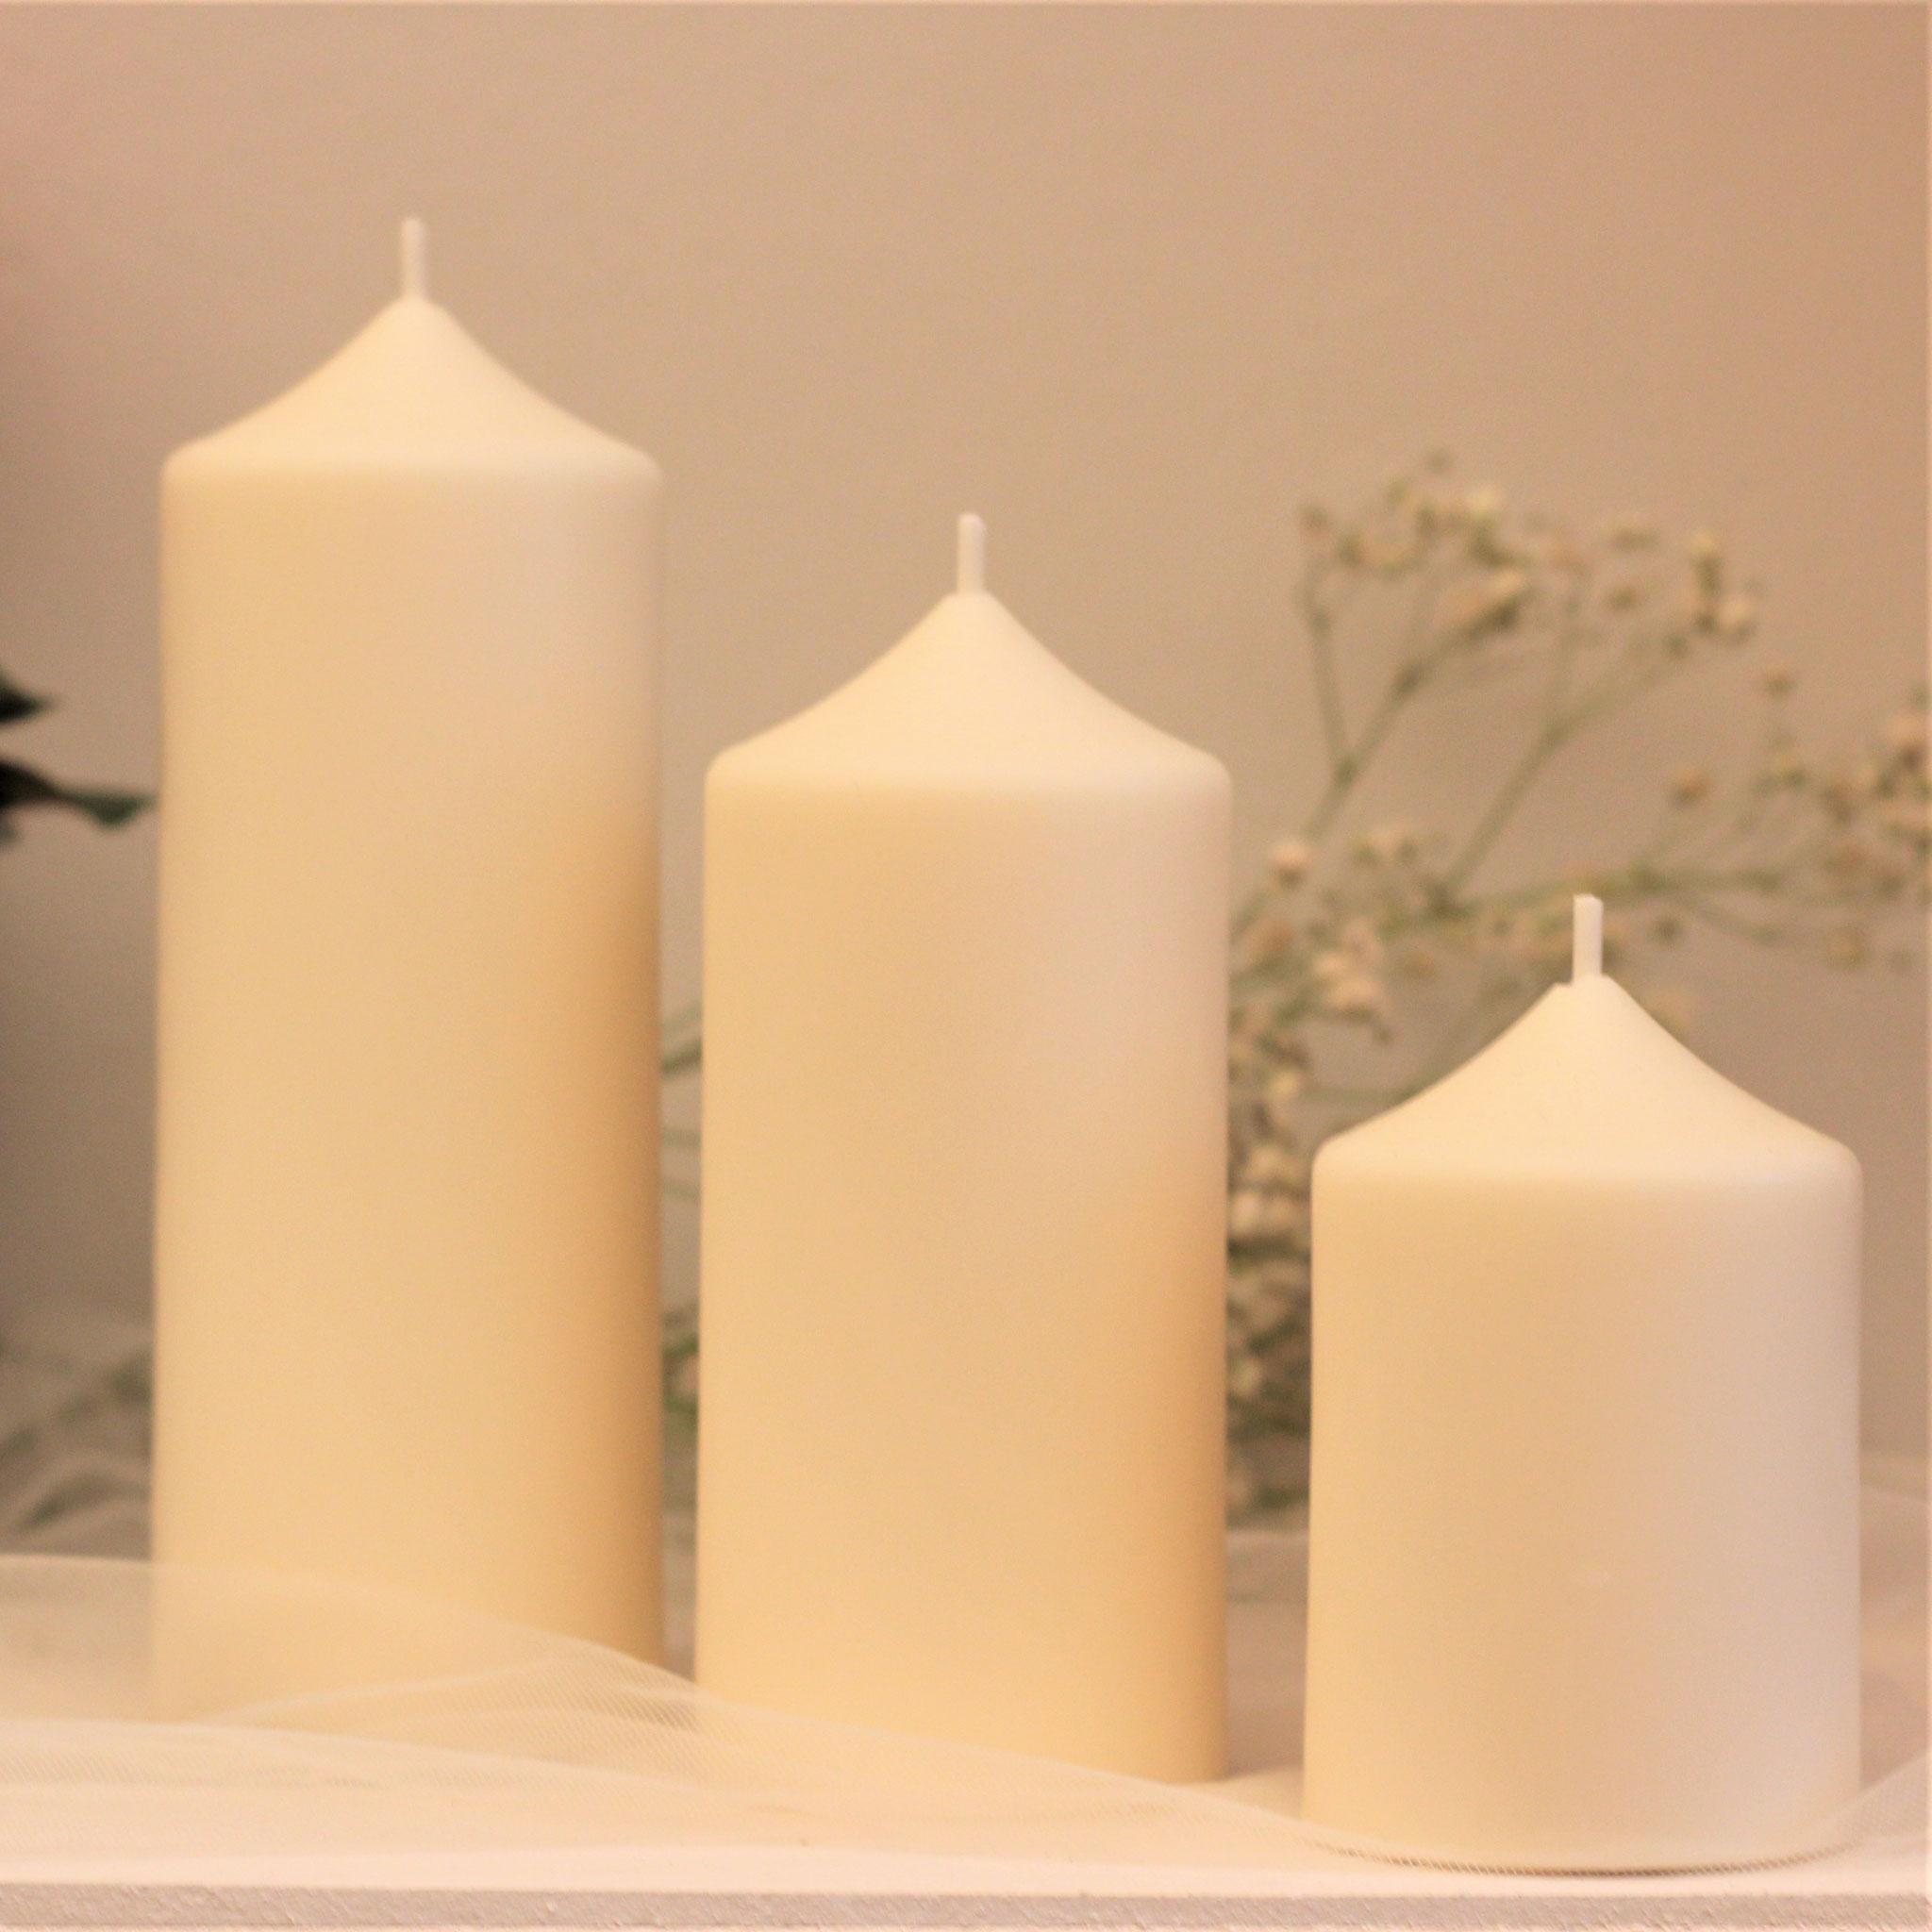 Kerzengröße 6 cm Durchmesser